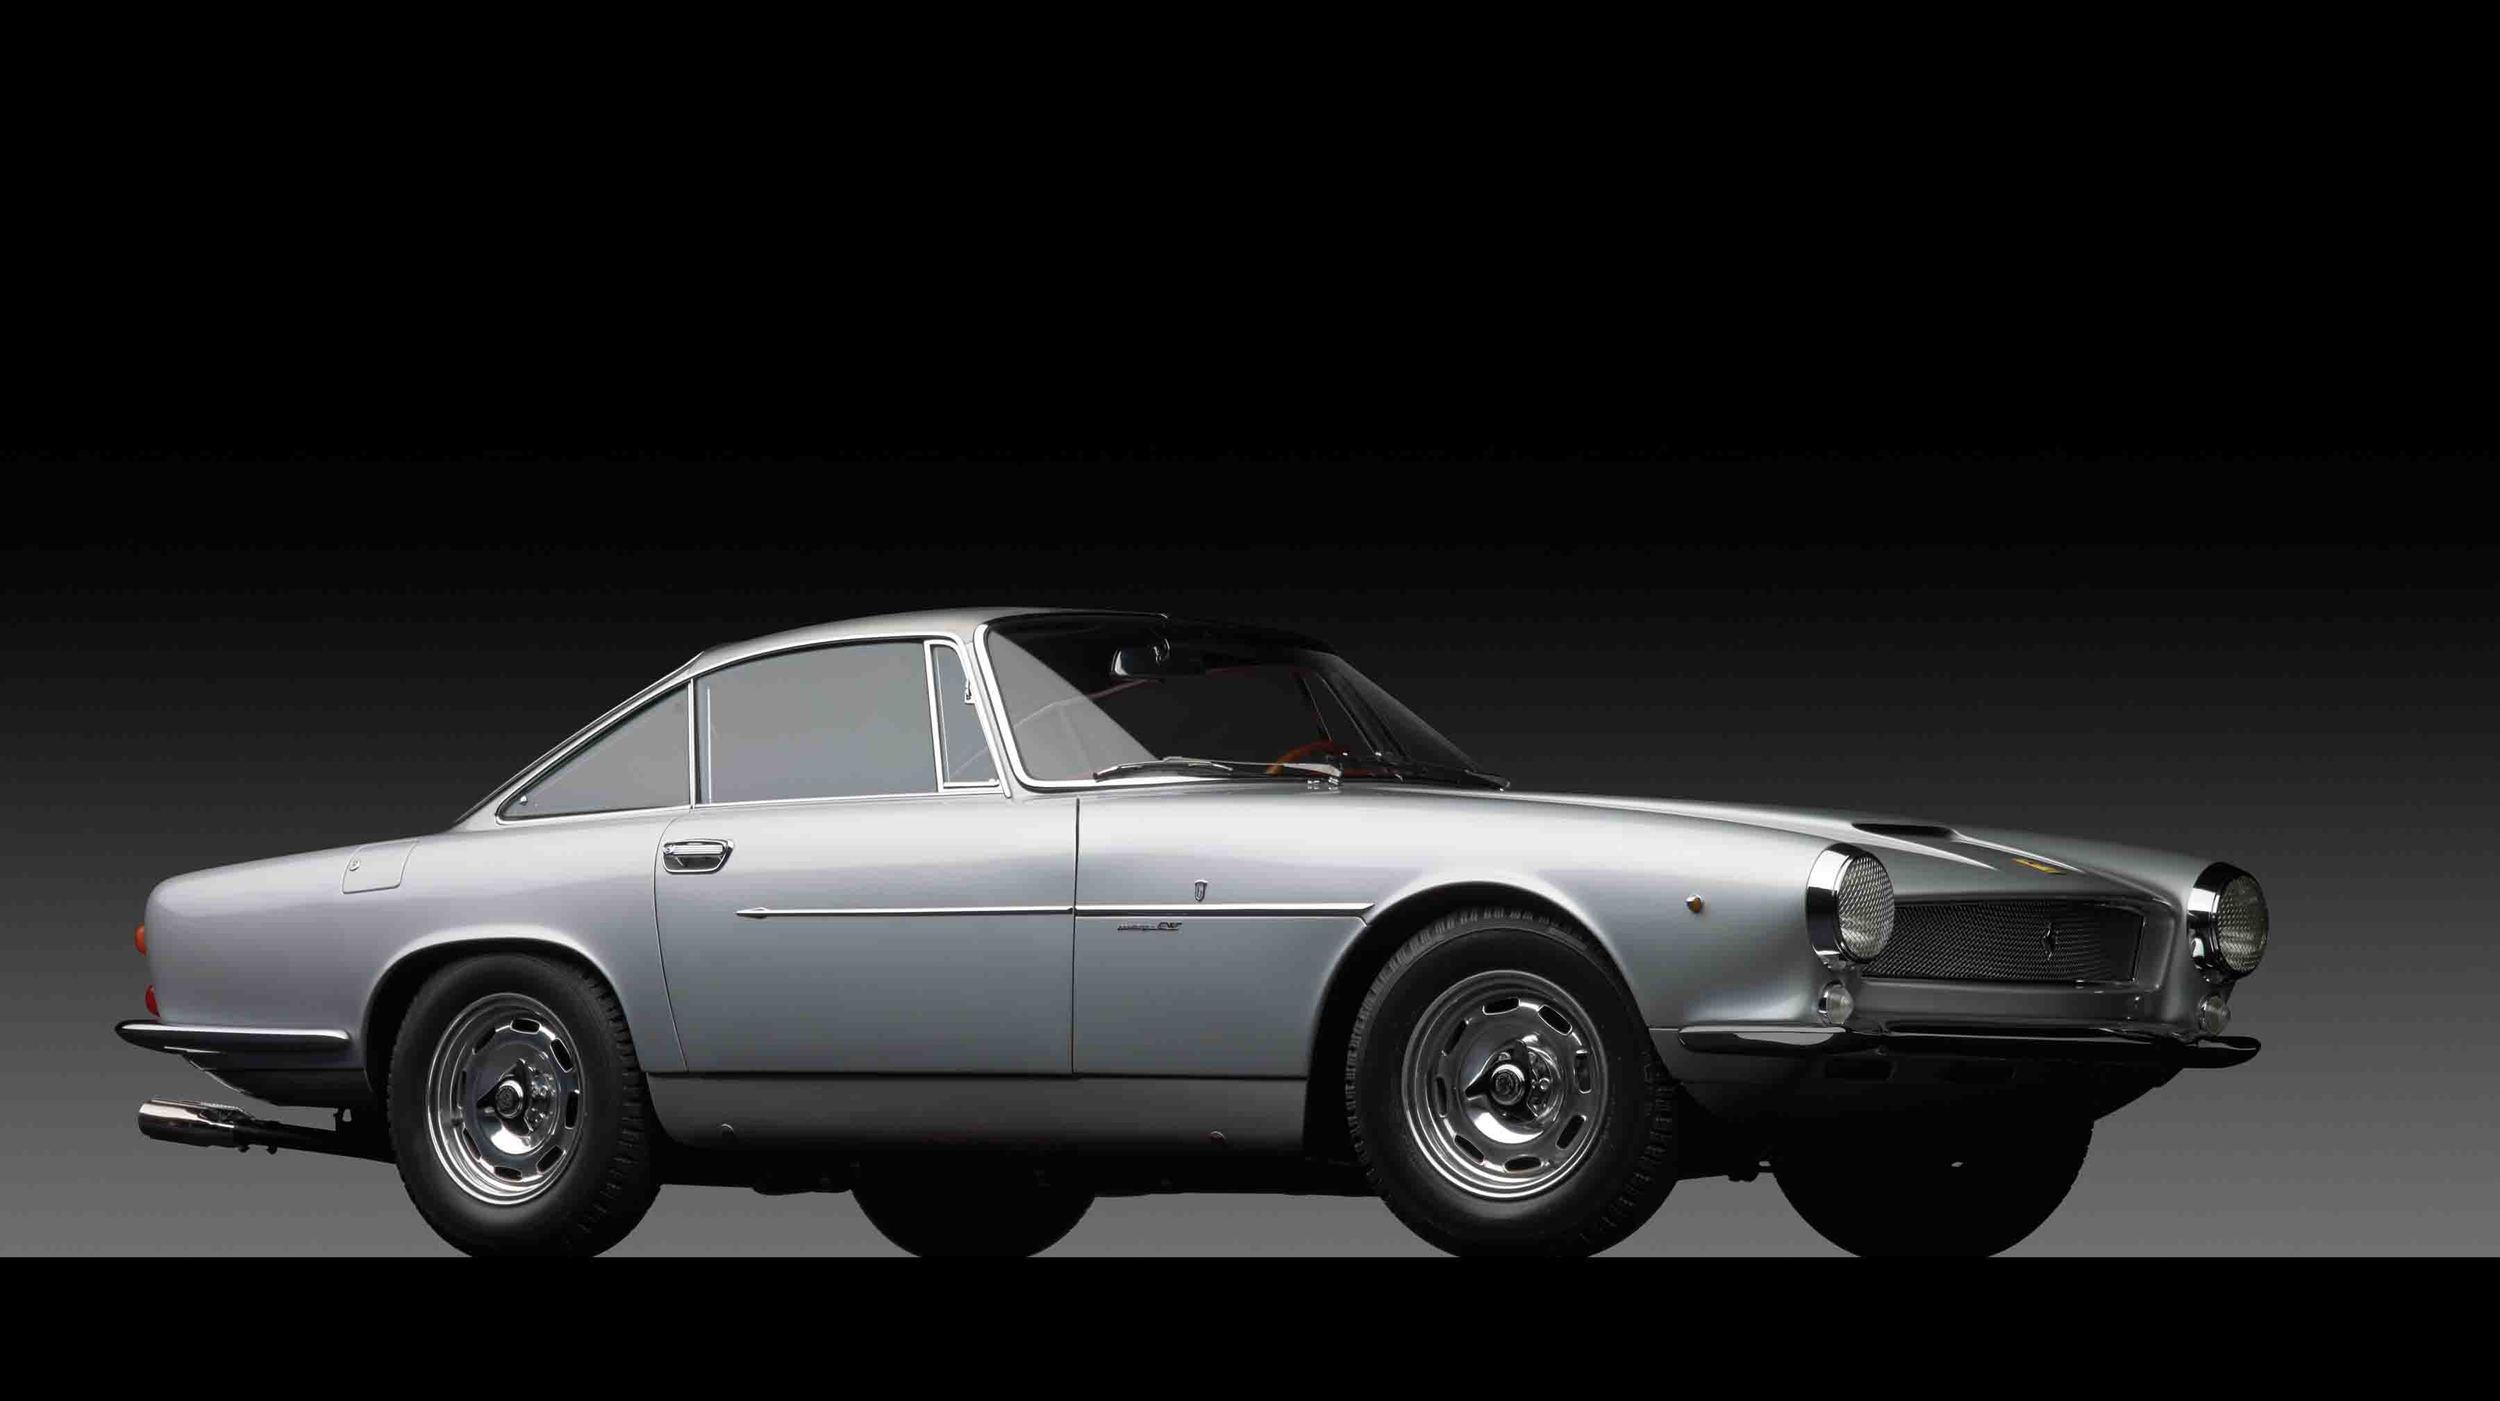 "NY13_r138_001 img alt=""ferrari 250 bertone giugiaro the art of the automobile the car crush"" .jpg"